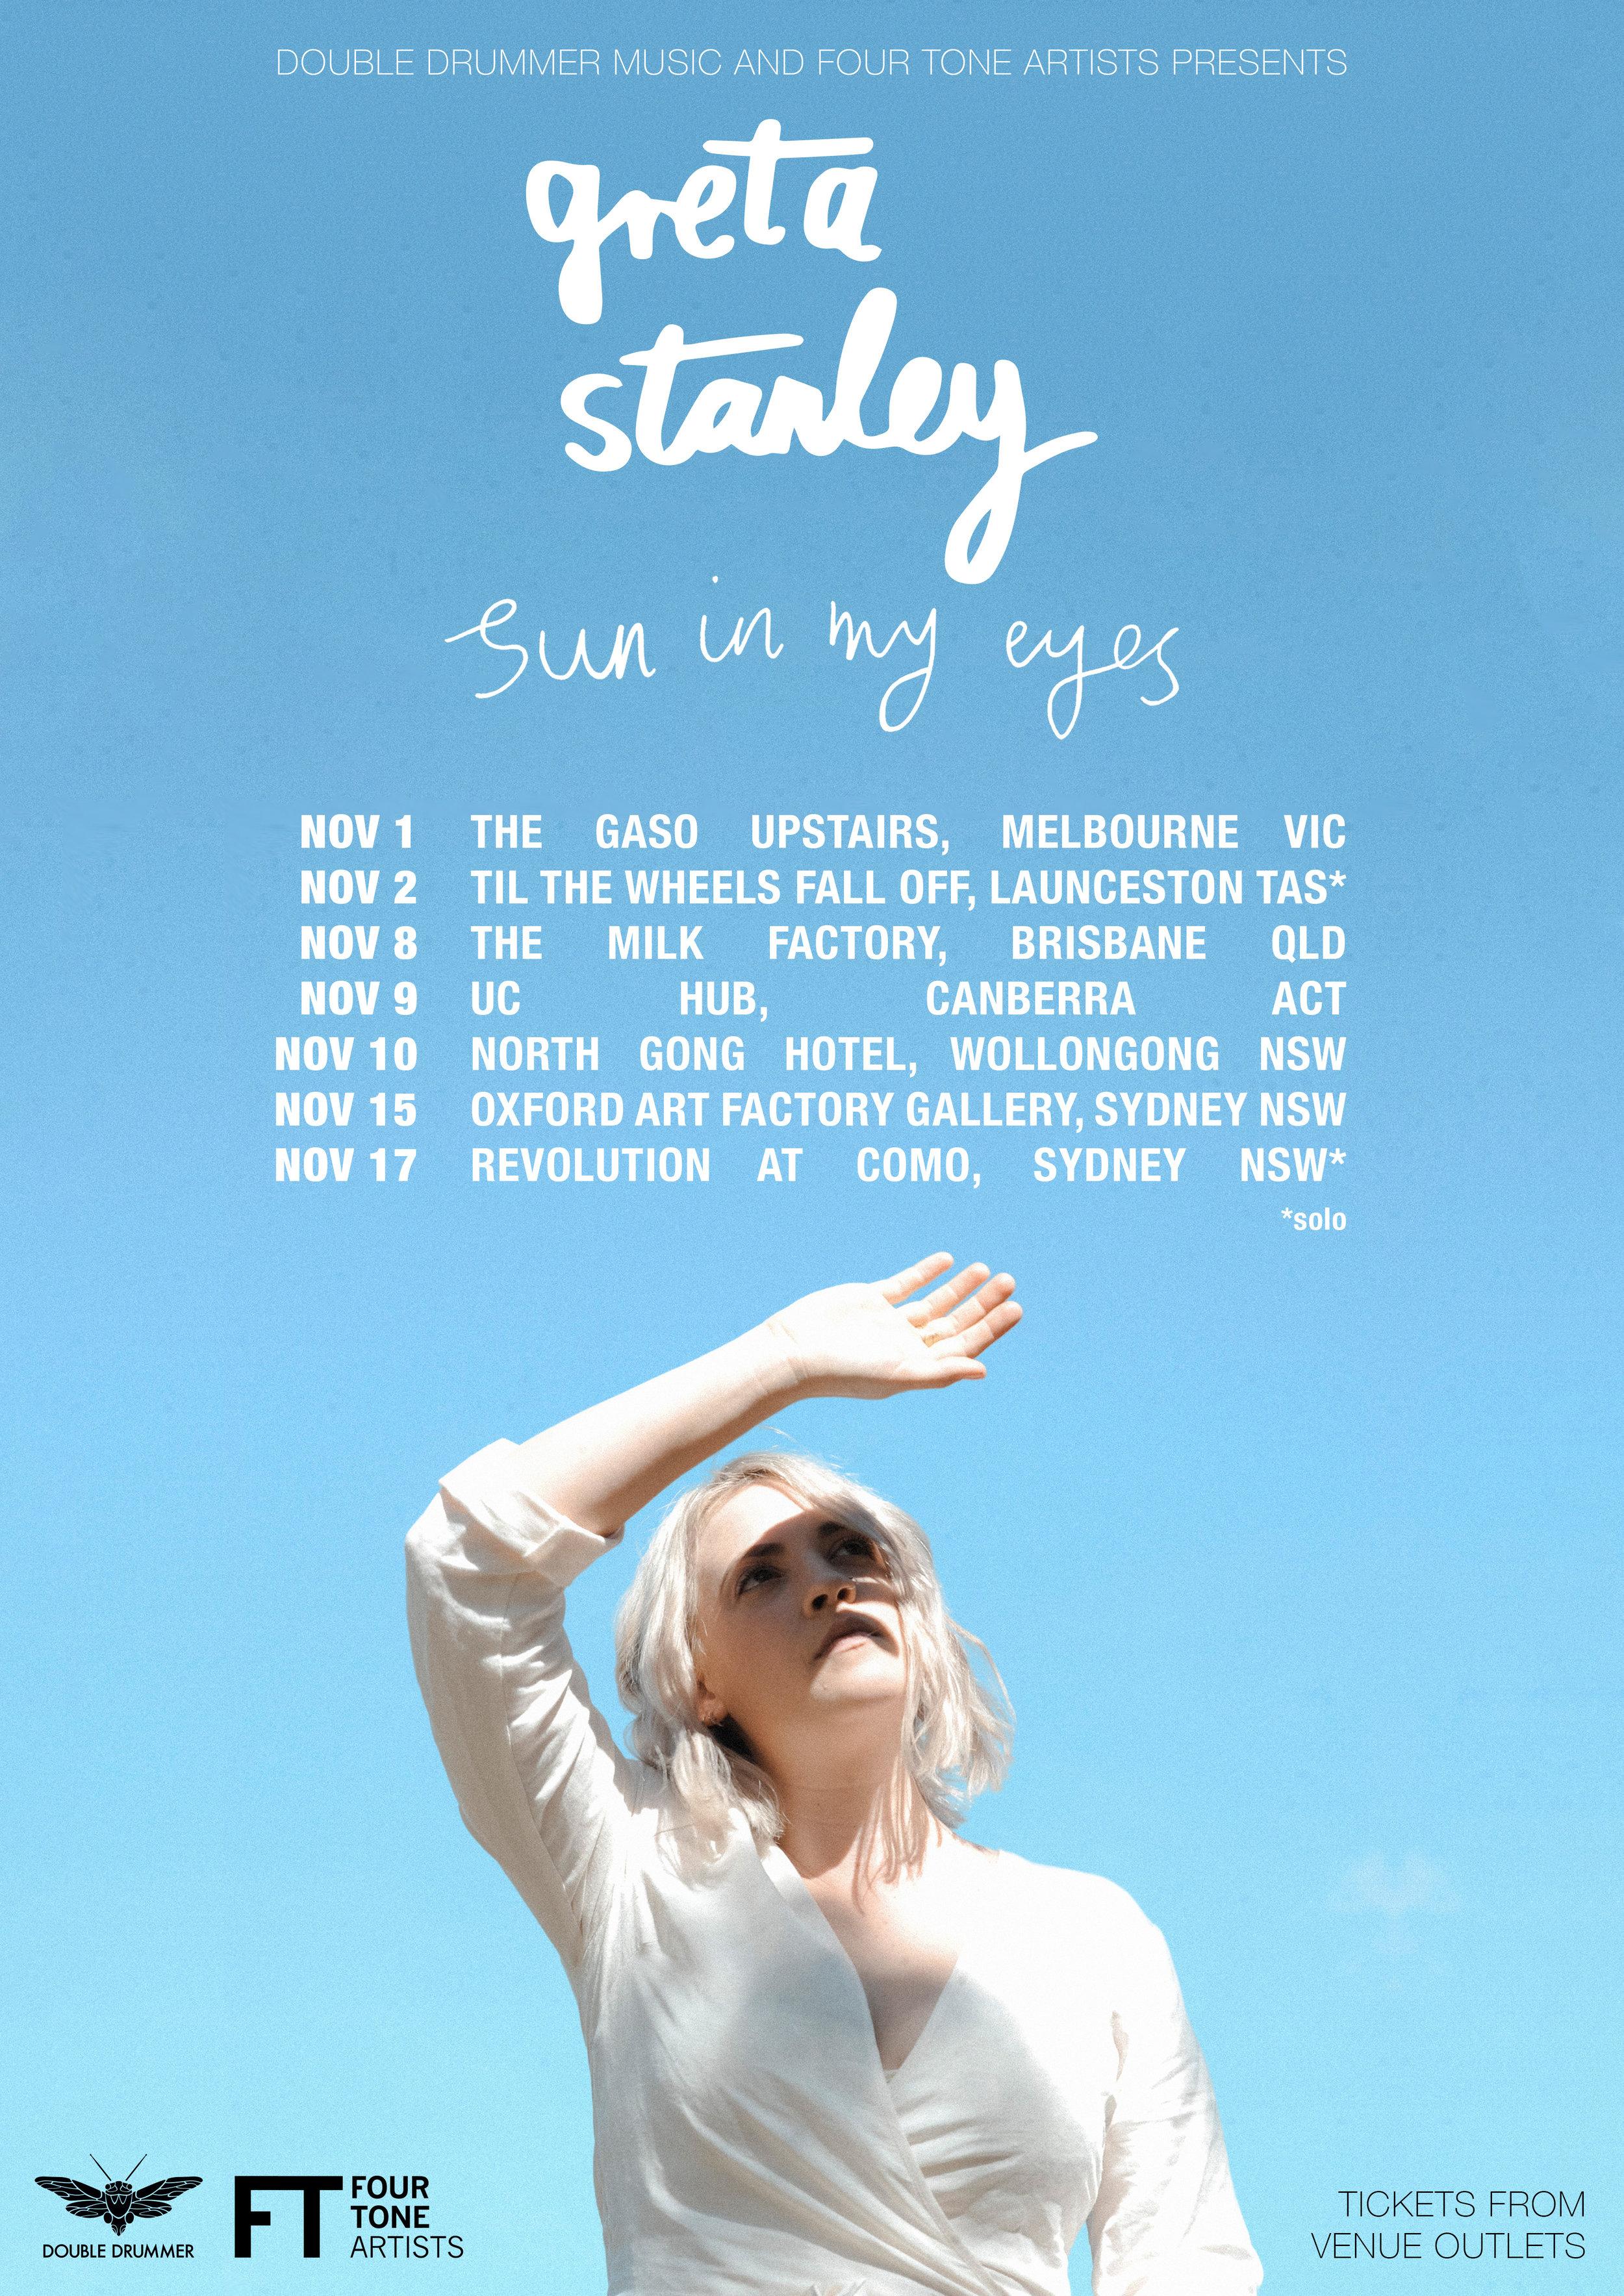 sun in my eyes tour poster - headline dates.jpg